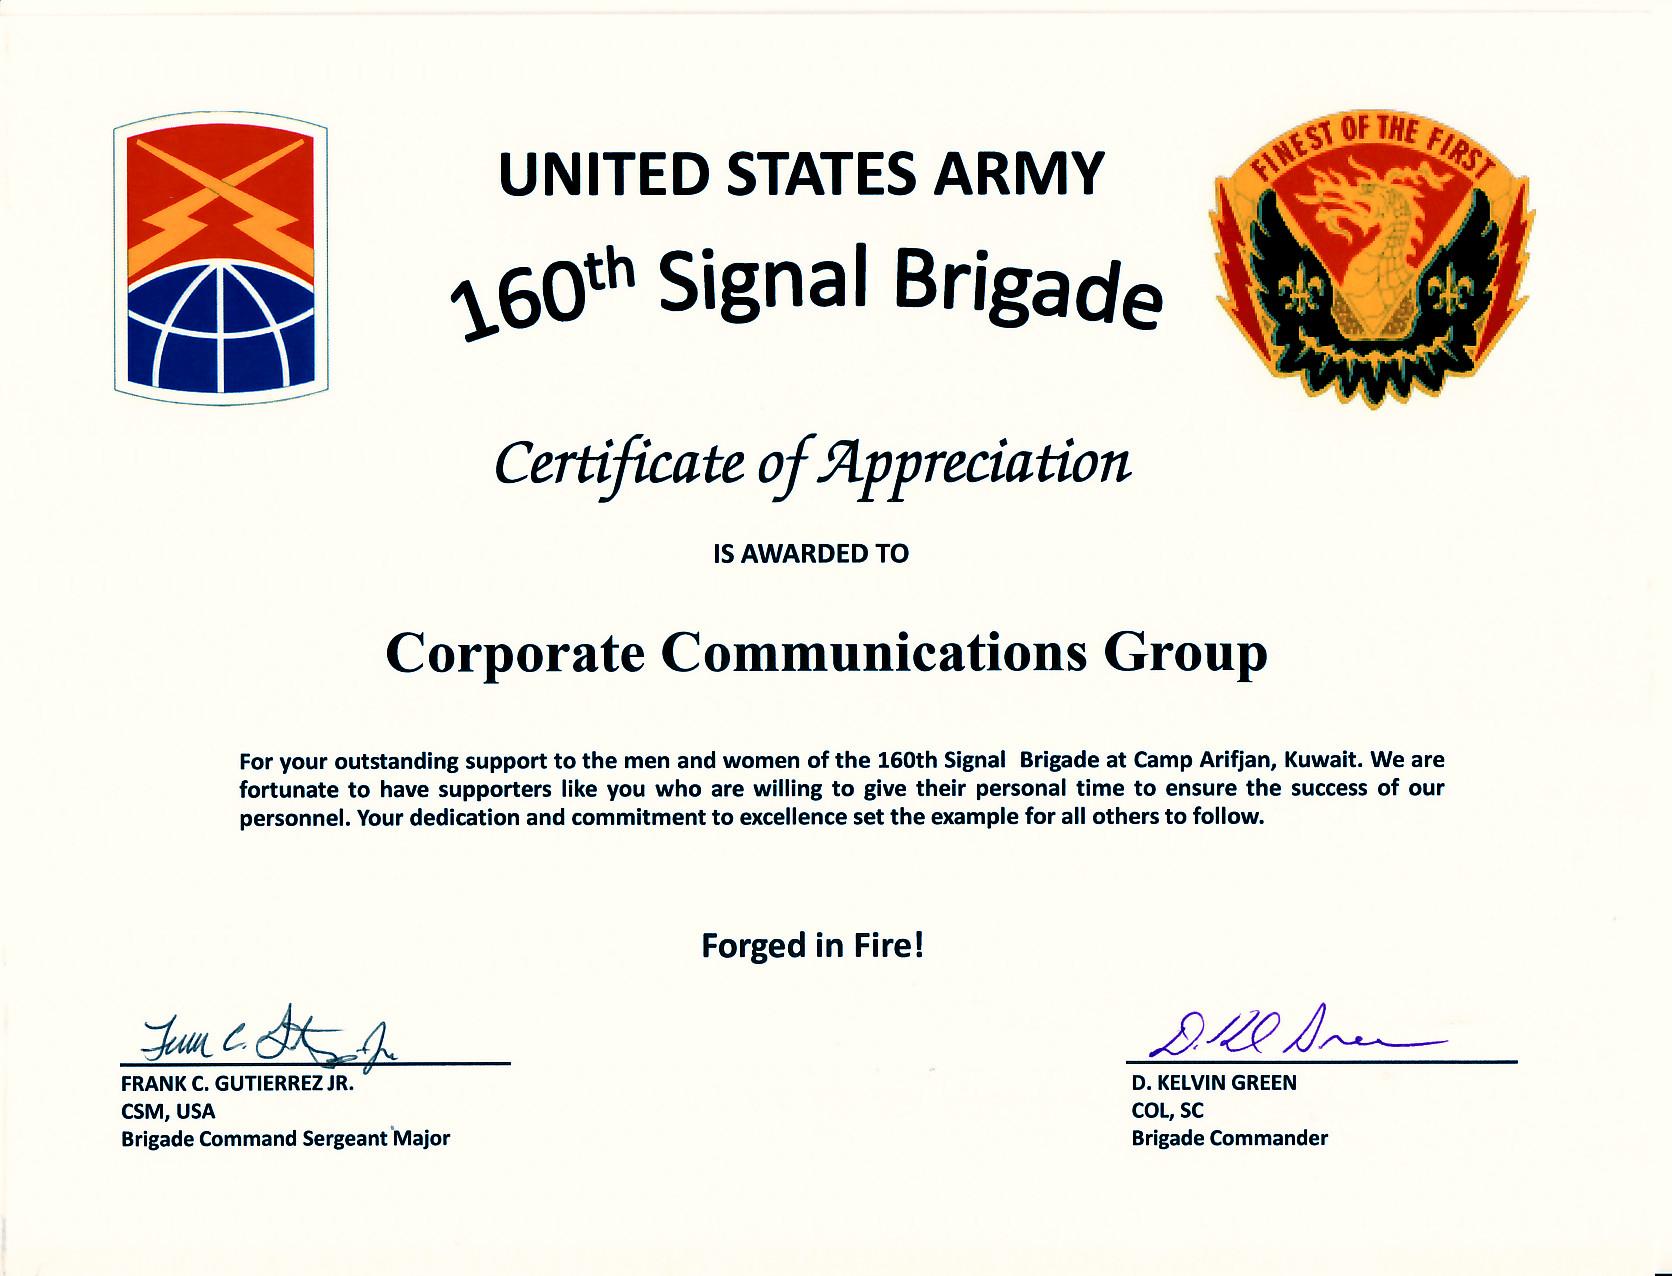 Army Certificate Of Appreciation Ccg Receives Certificate Of Appreciation From U S Army